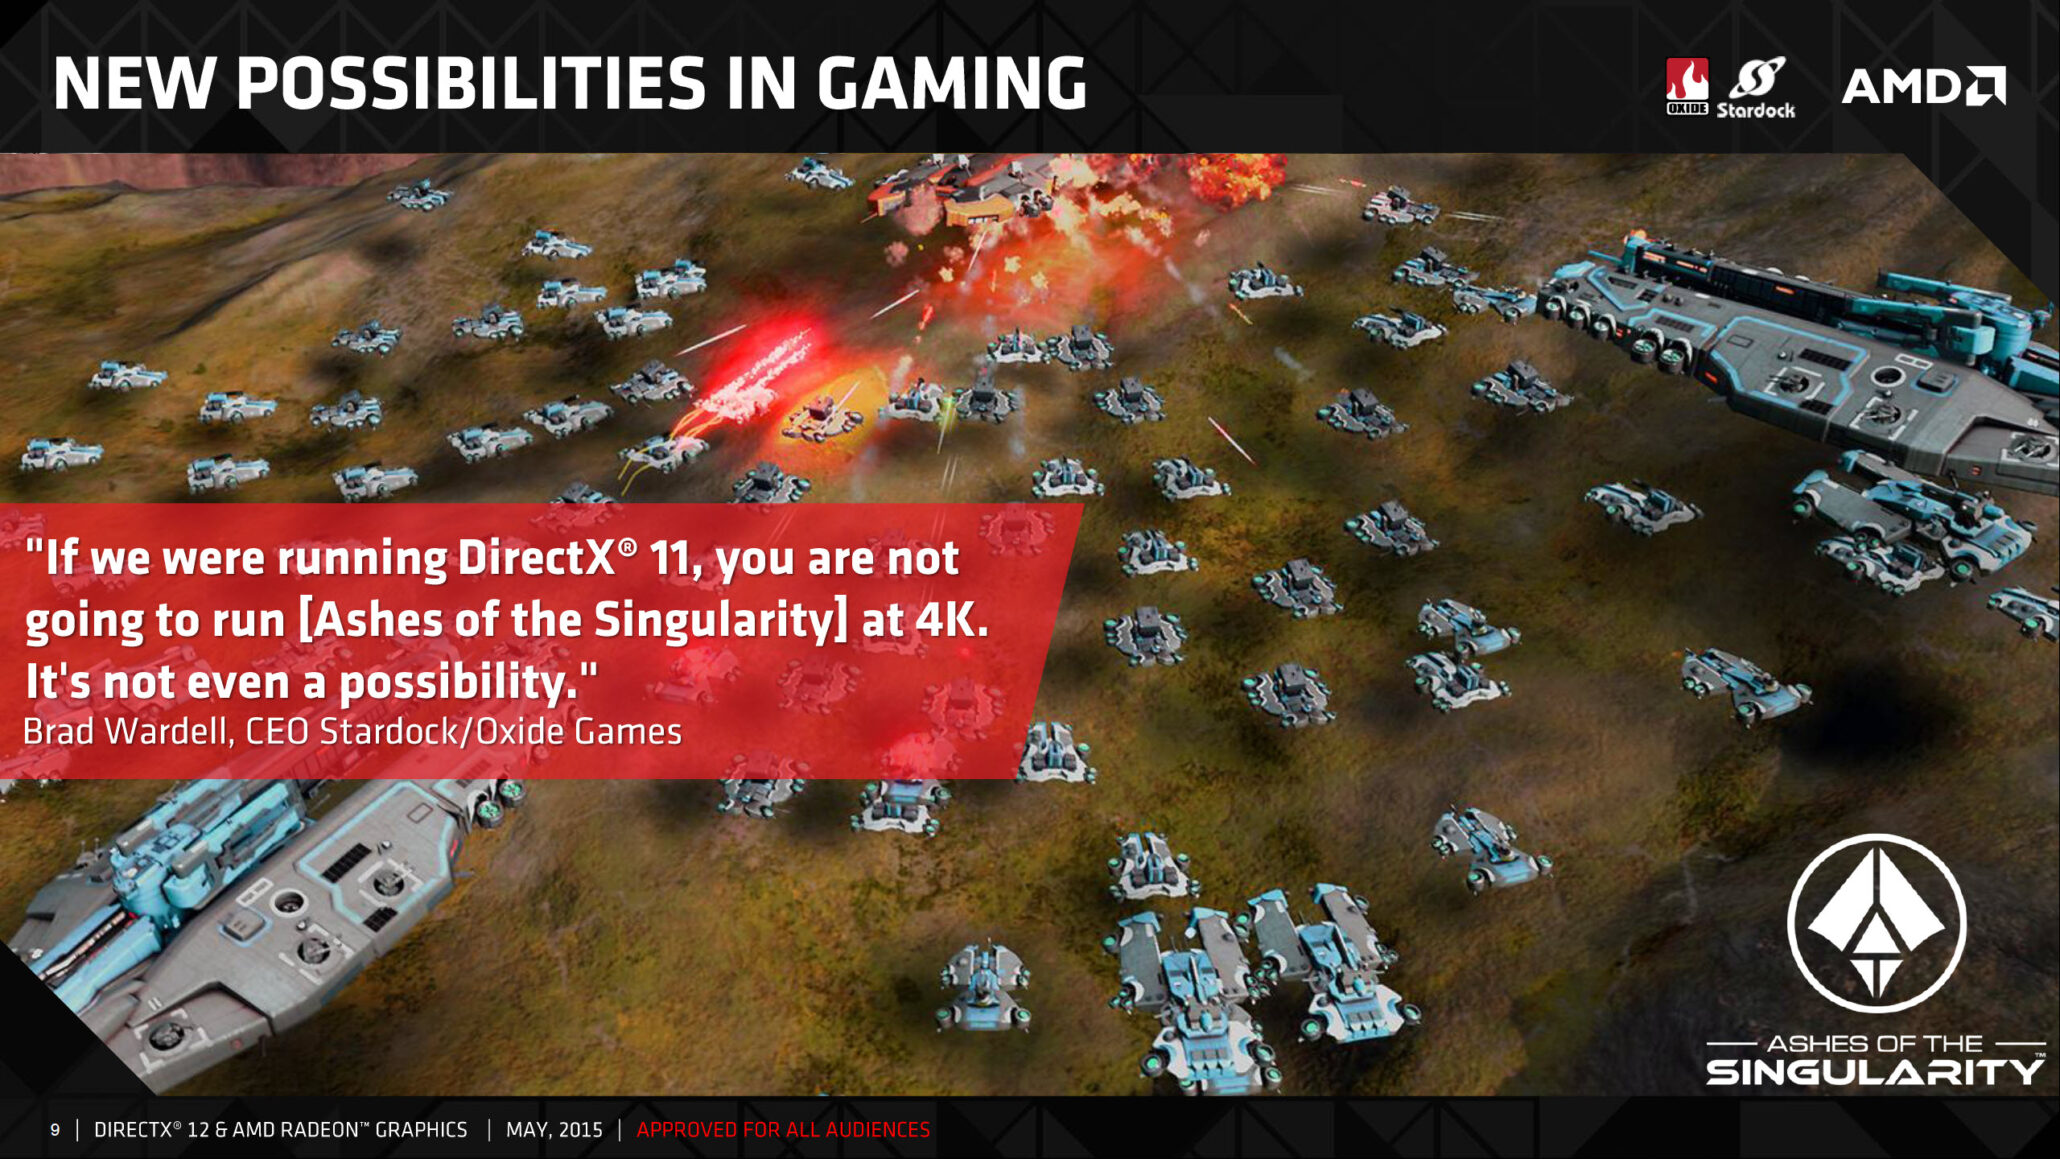 amd_directx-12_ashes-of-singularity-1